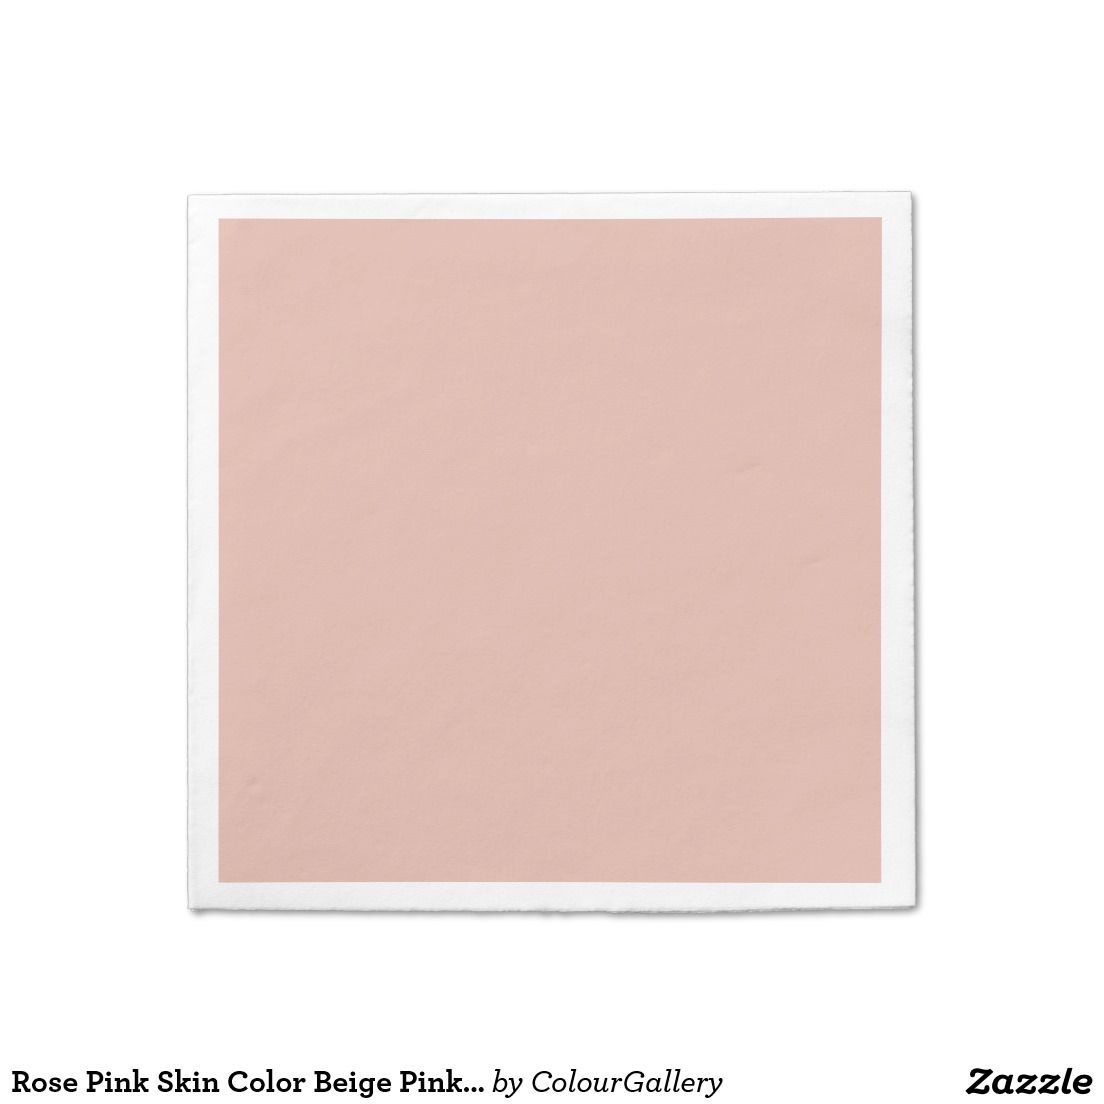 Rose Pink Skin Color Beige Pinkish Portrait Blush Disposable Napkin